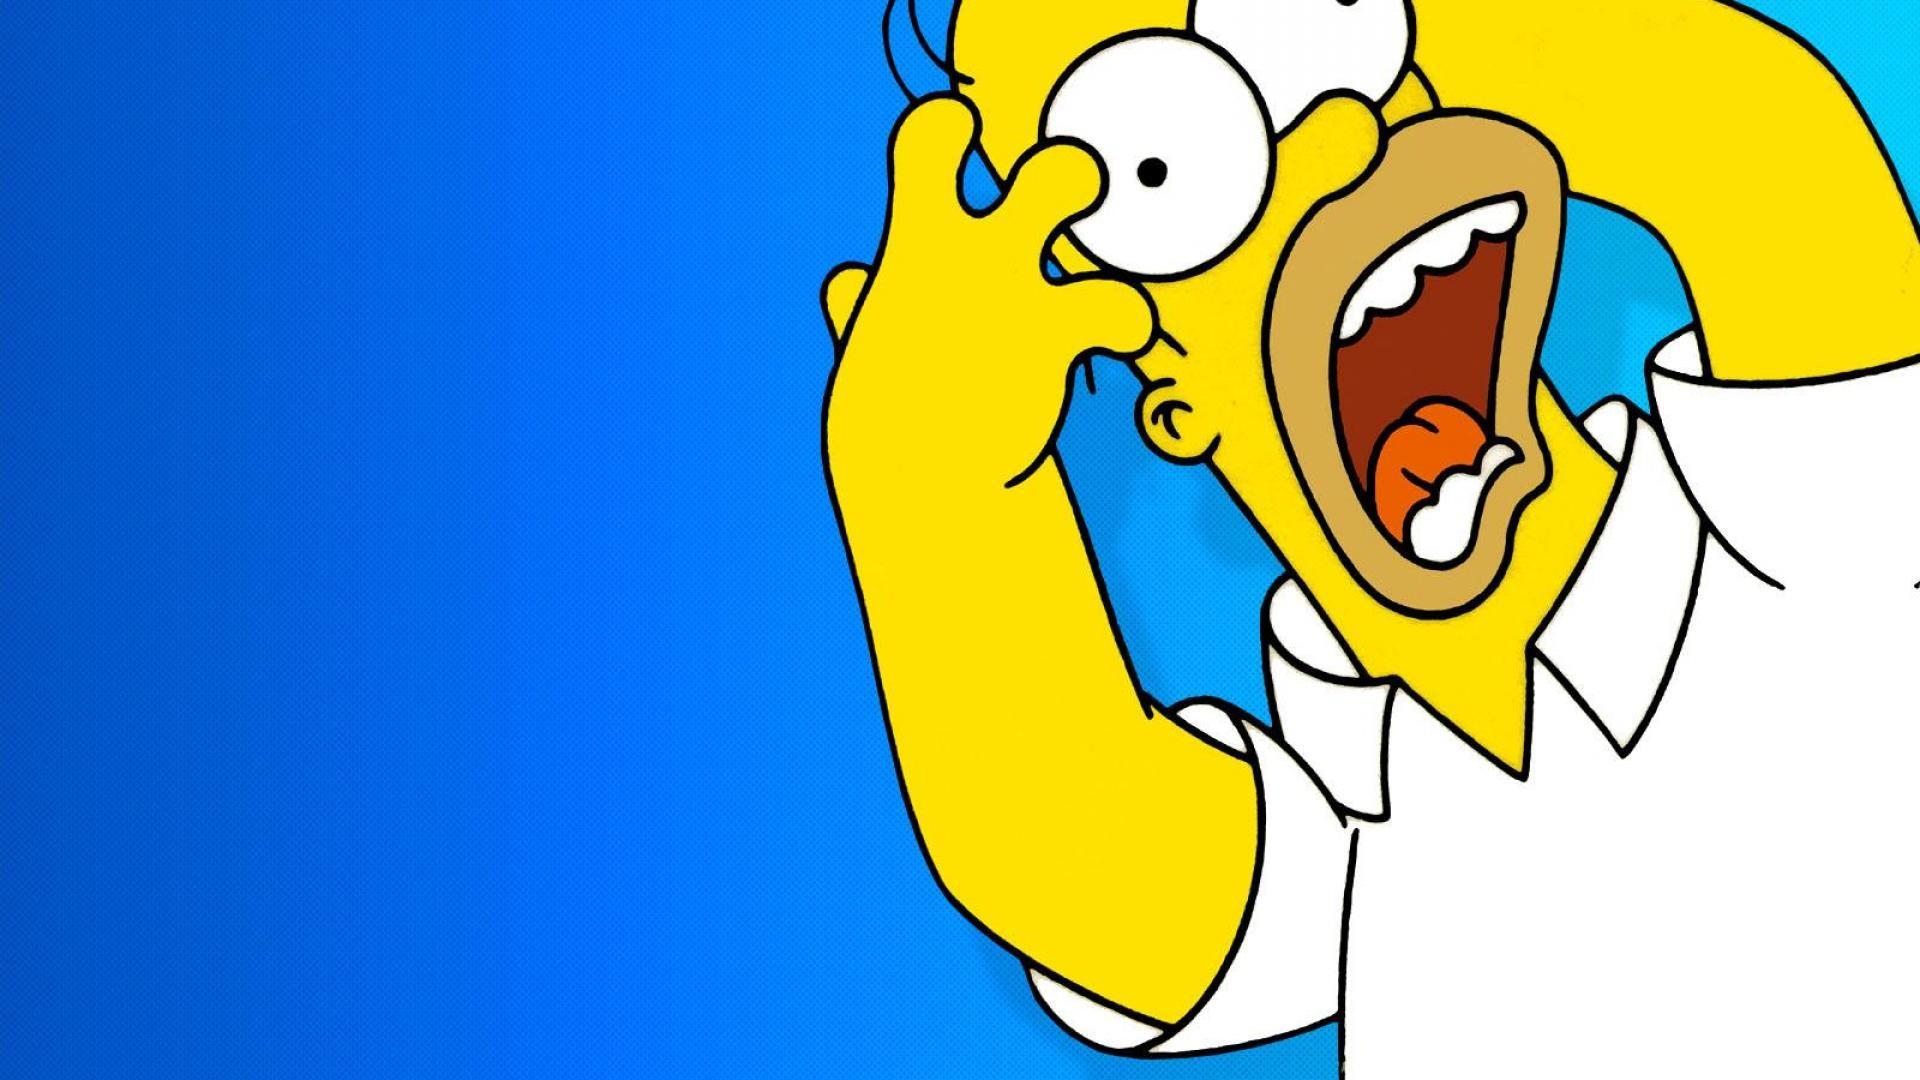 Samsung Galaxy Wallpaper Hd Bart Simpson Hd Wallpaper 74 Images